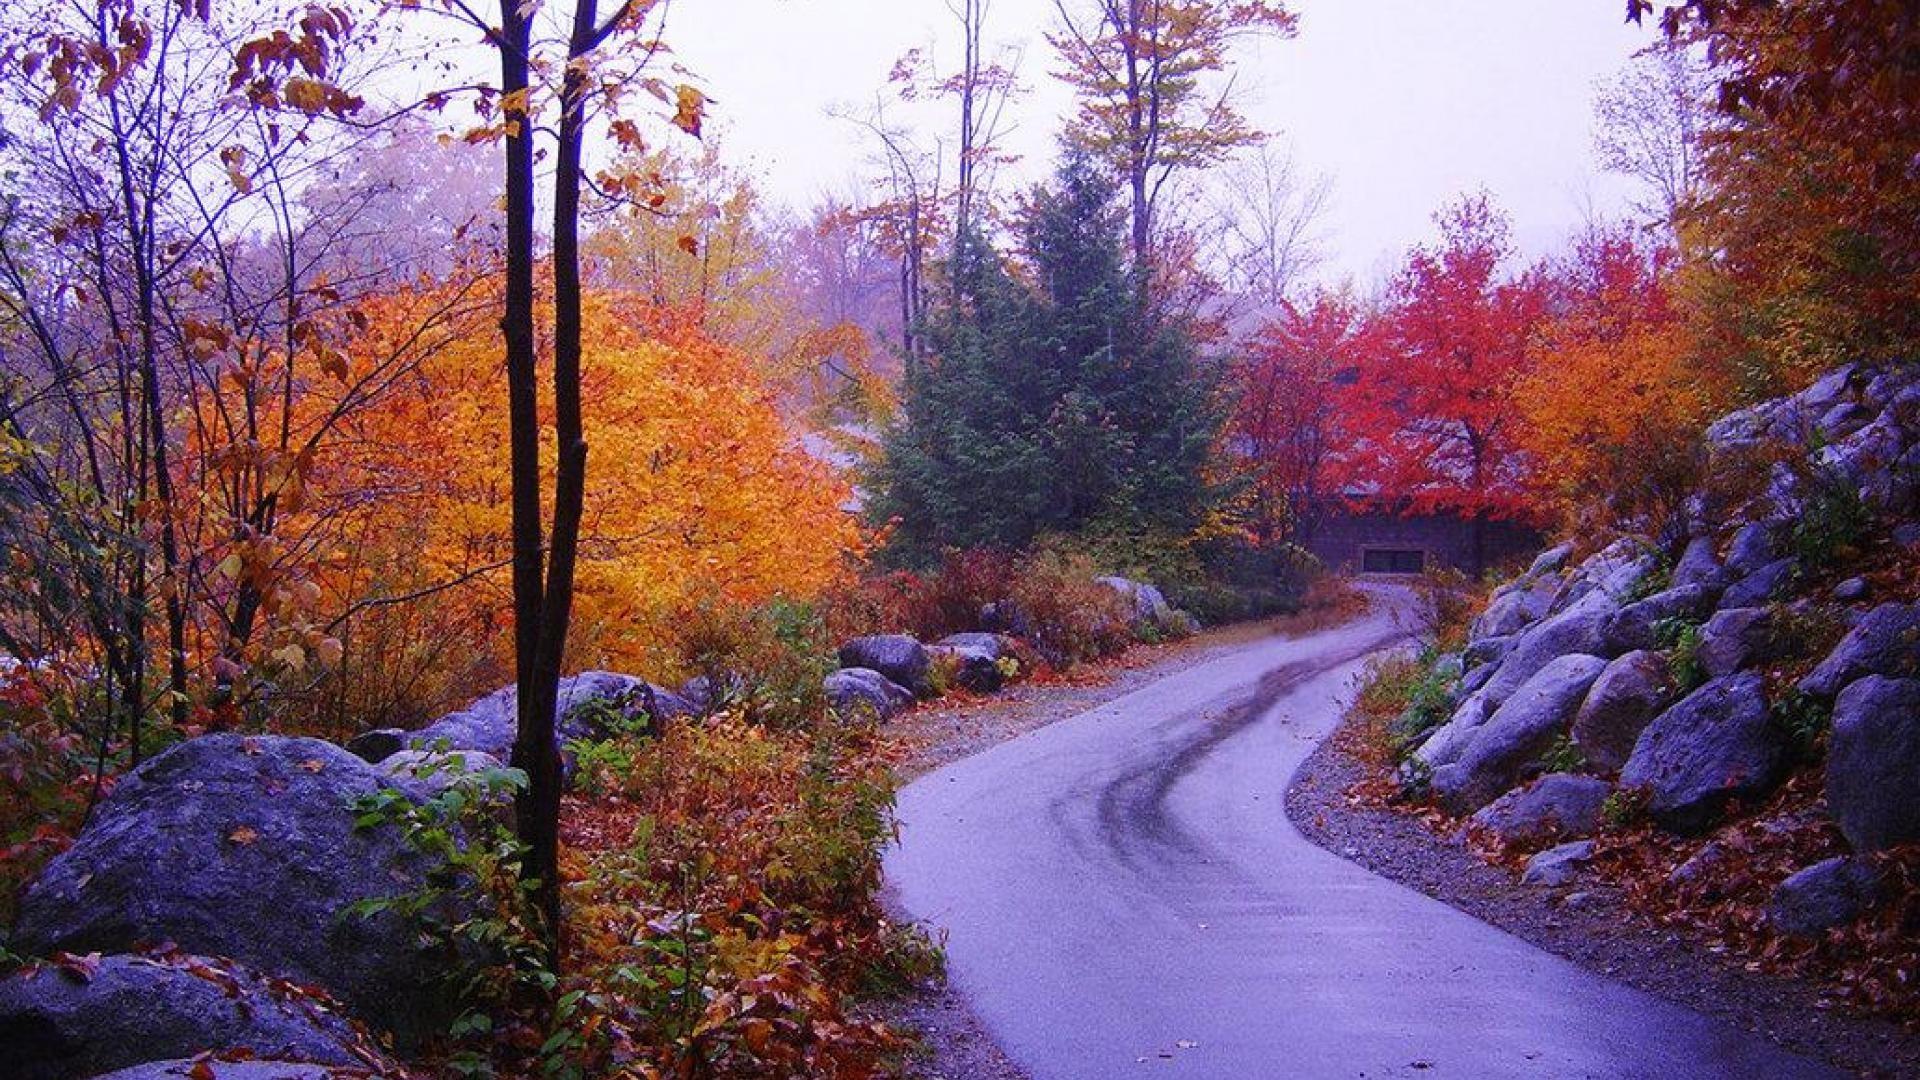 New England Fall Foliage Desktop Wallpaper New England Fall Wallpaper 36 Images